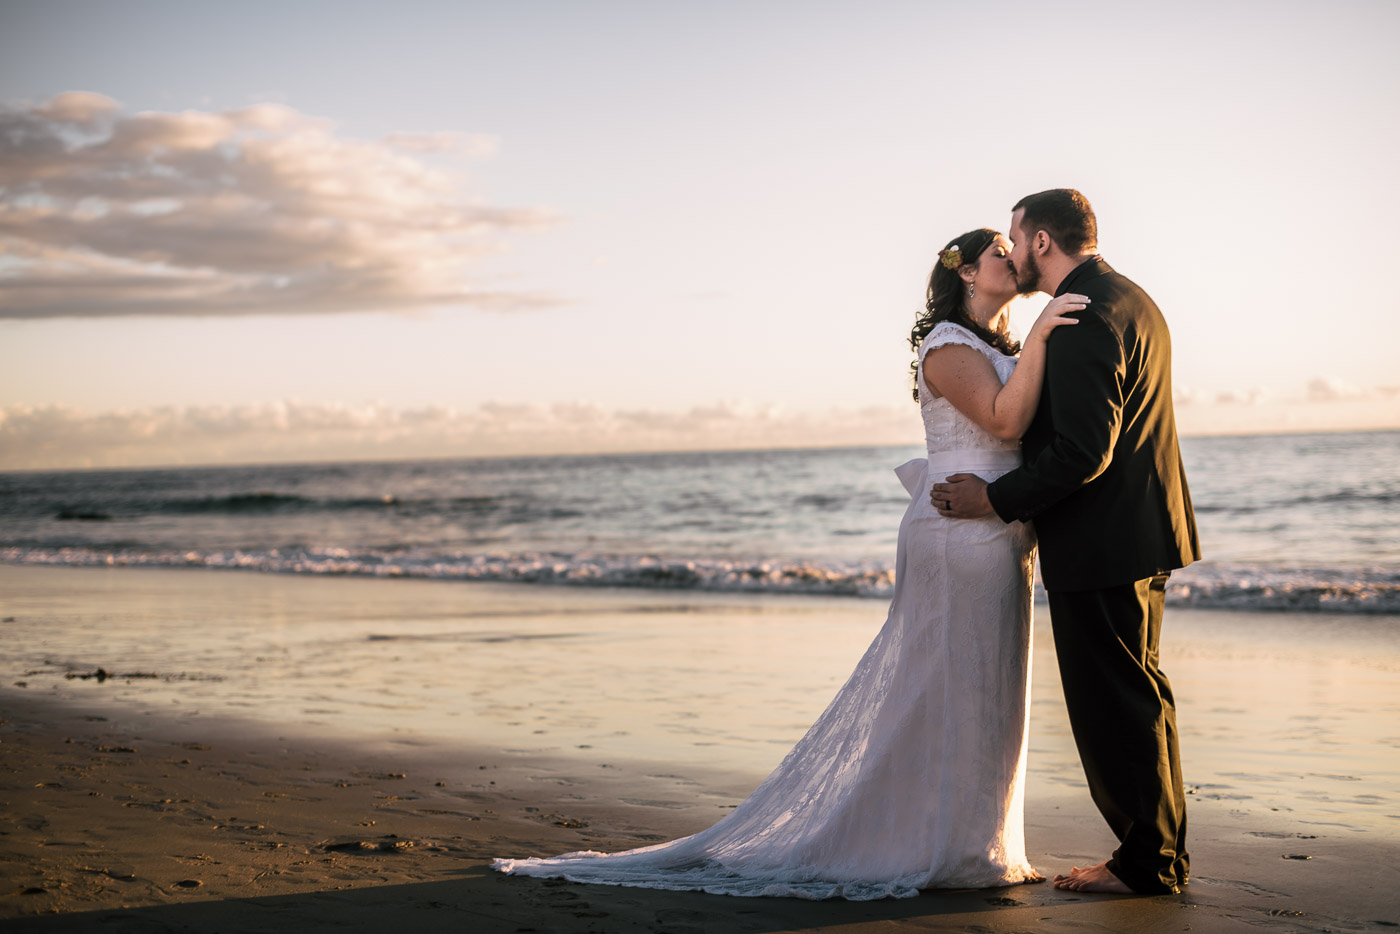 Best Califfornia wedding photographer captures romance at Laguna Beach,